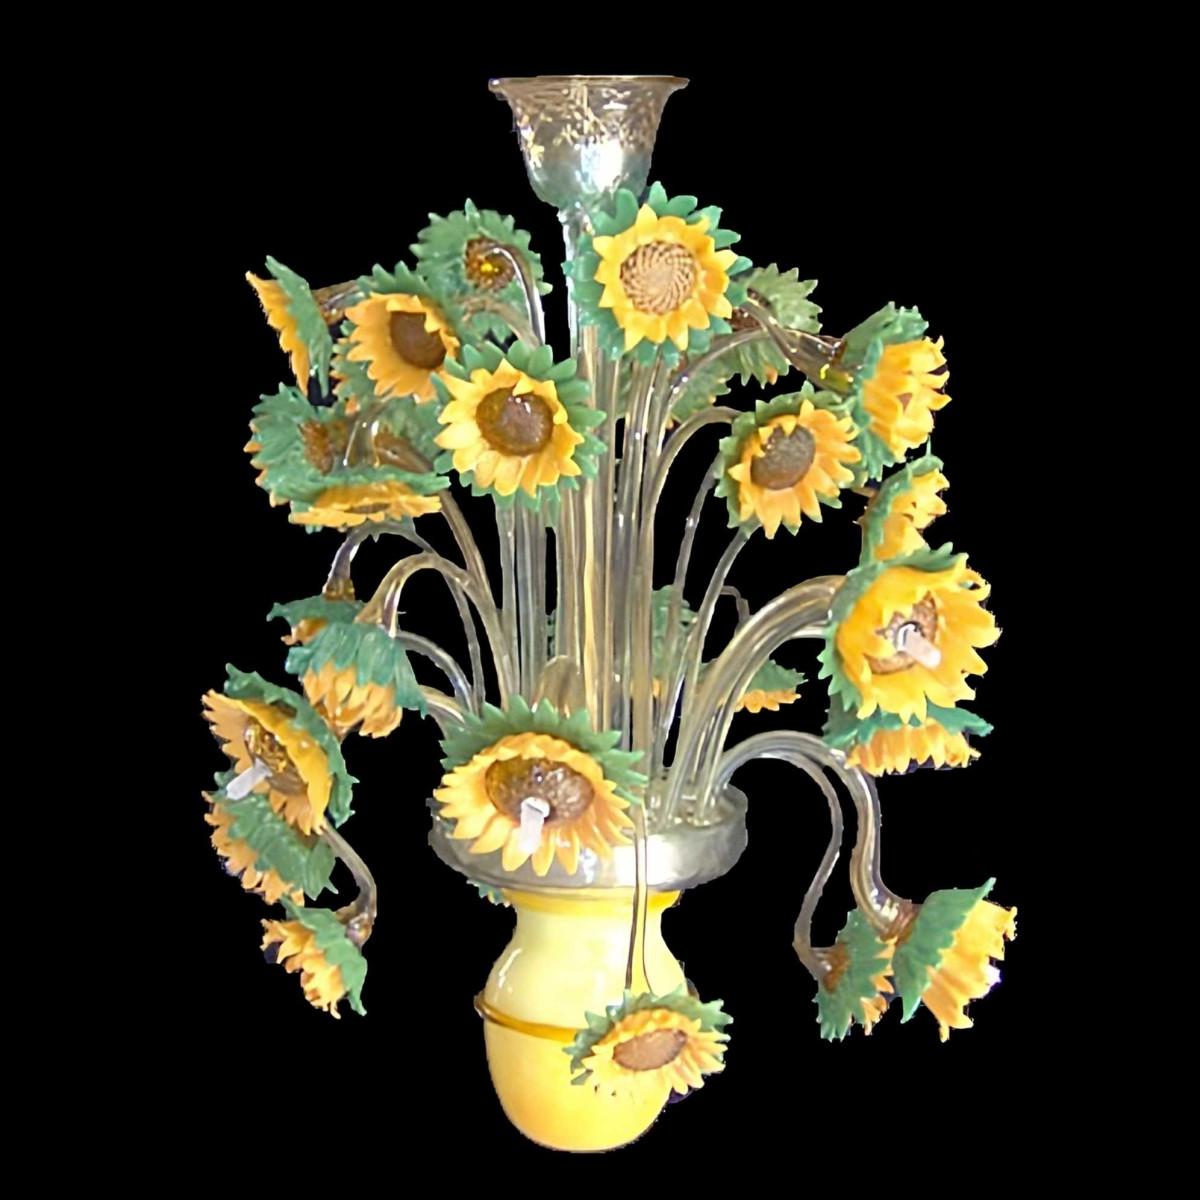 Girasoli (sunflowers) 9 lights Murano glass chandelier